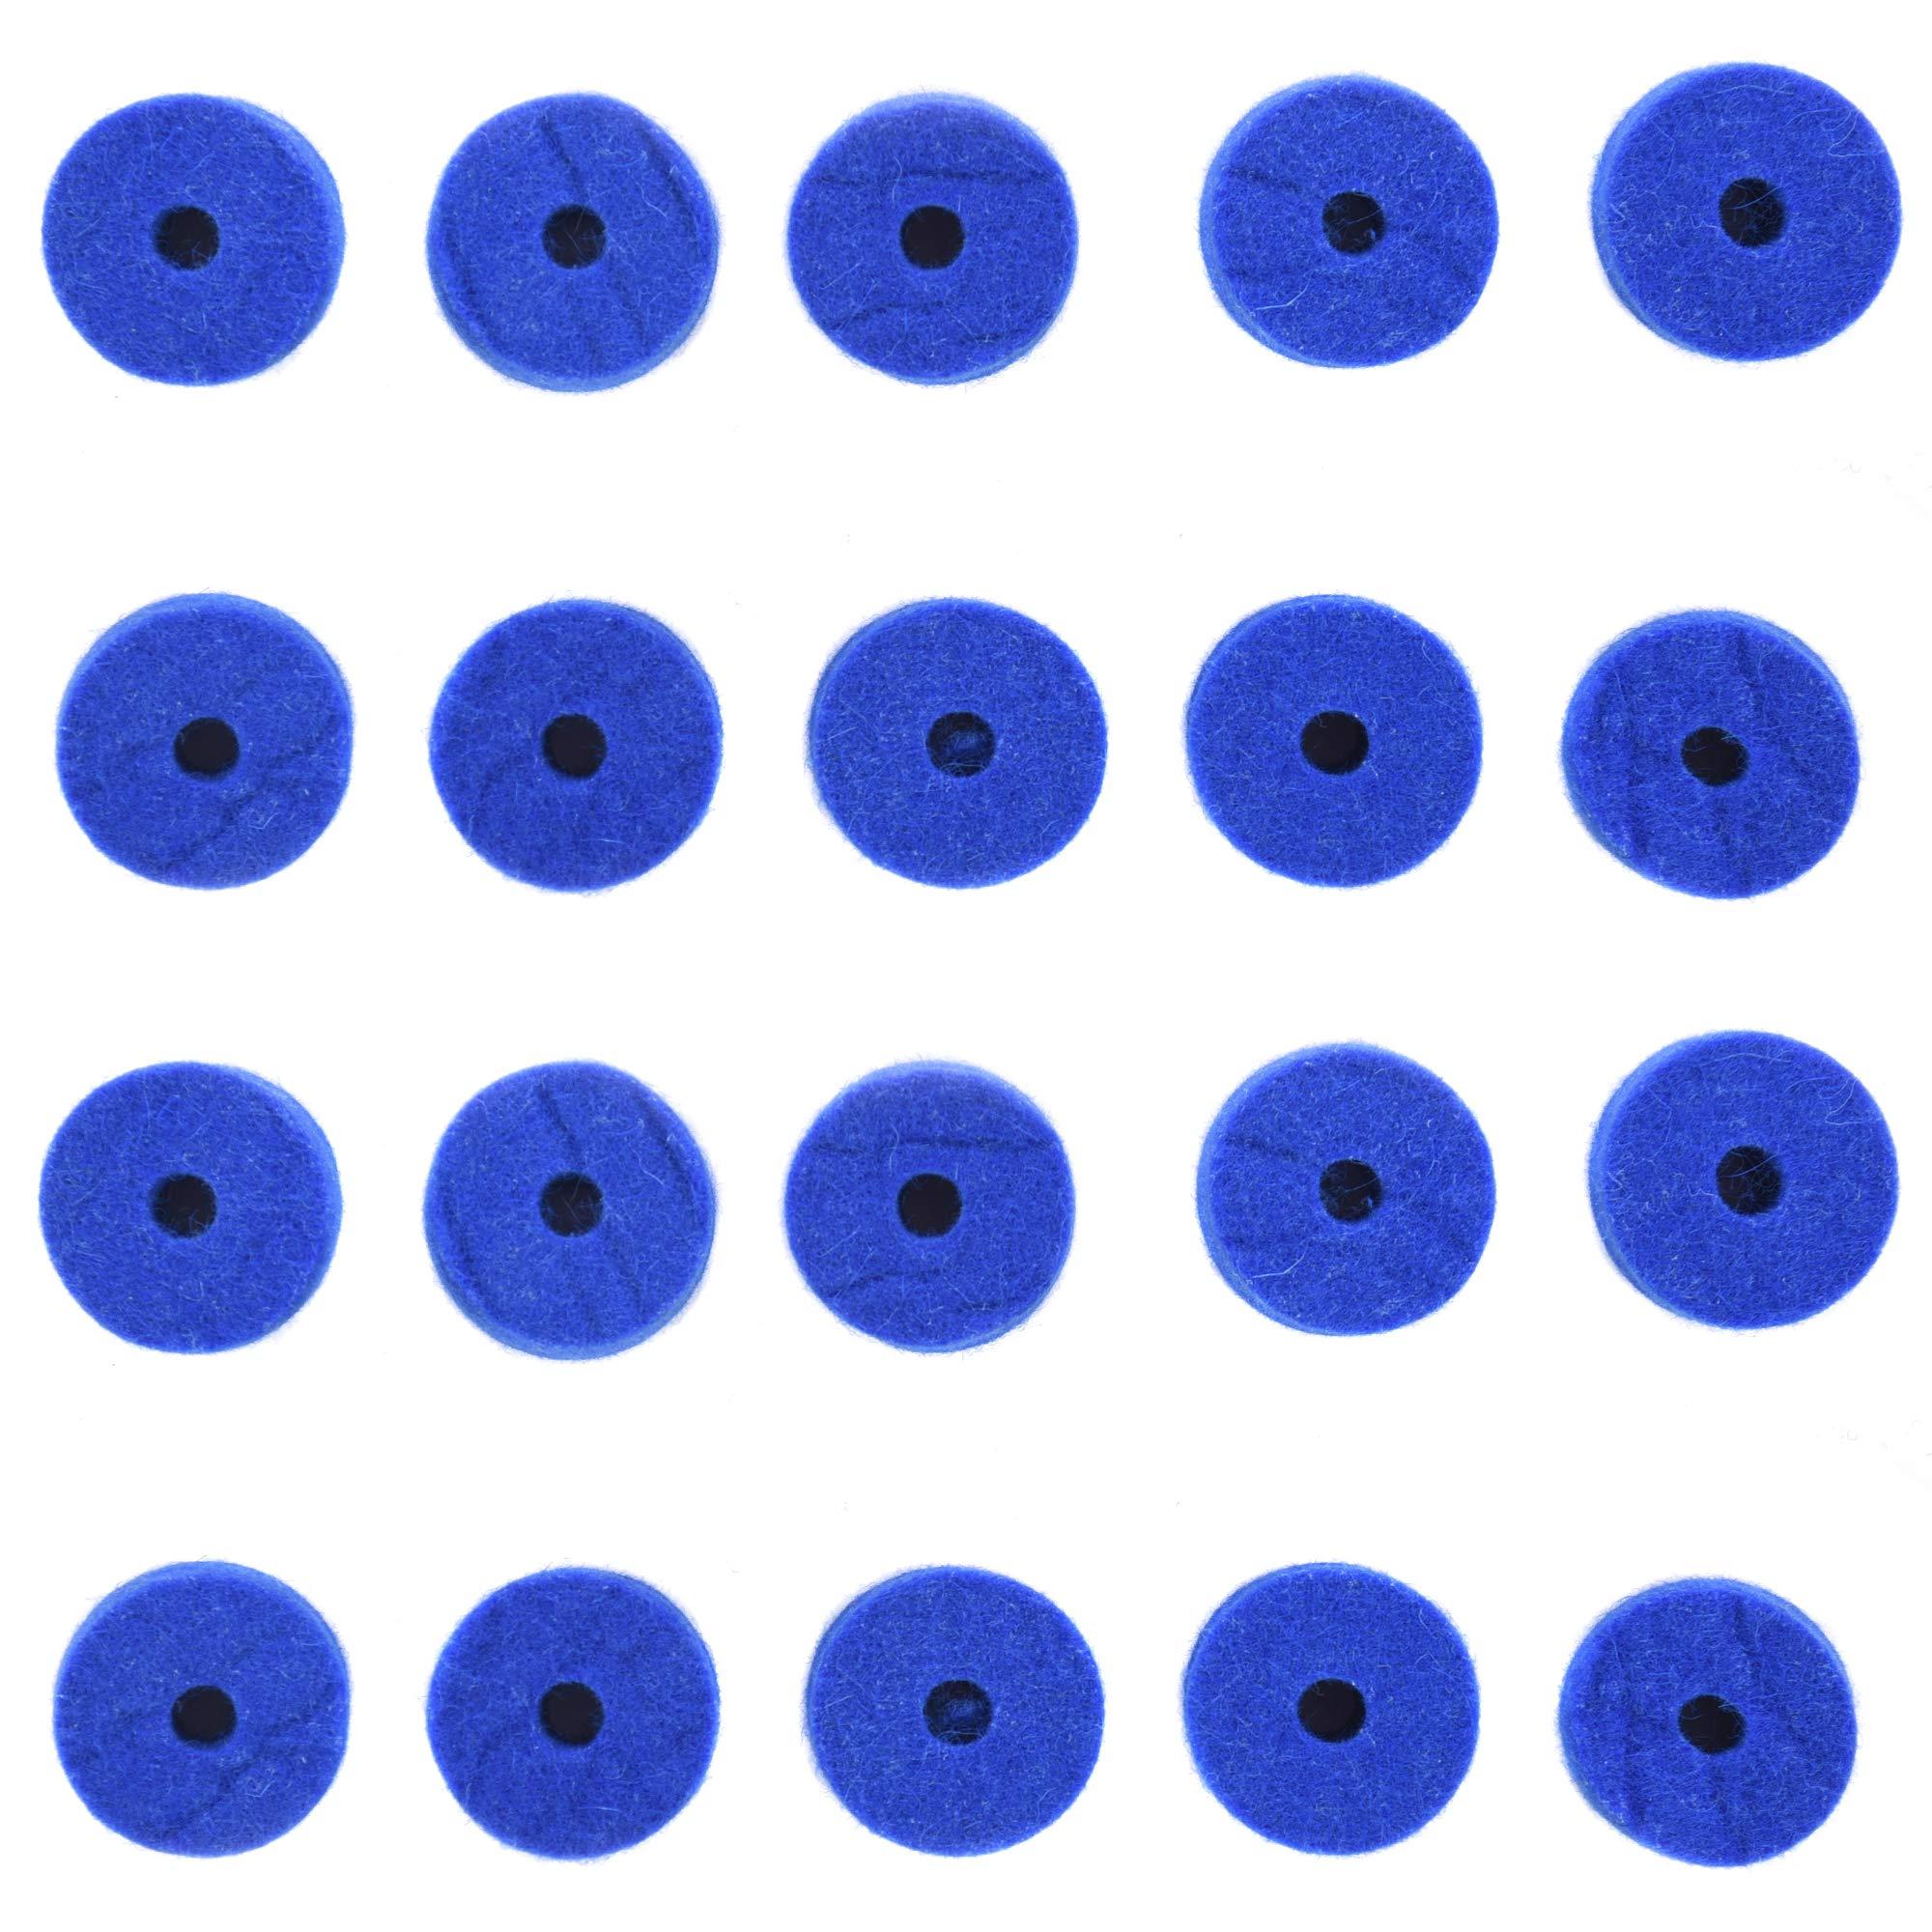 Ahead Wool Cymbal Felts Blue 20 Pack Bundle by Ahead